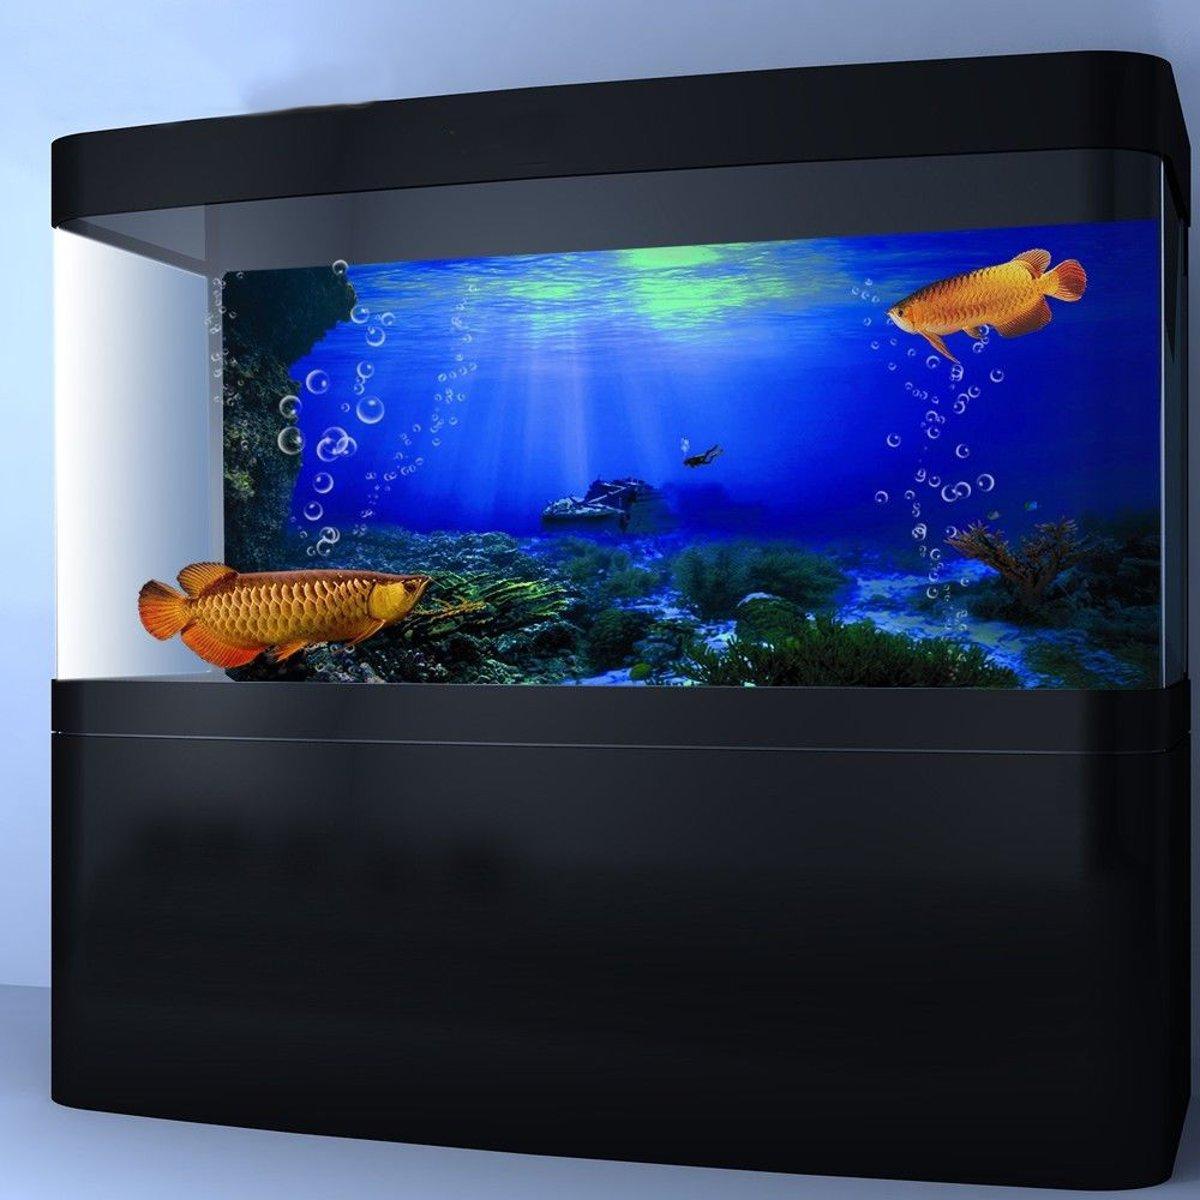 Seabed Wreck PVC Aquarium HD Background Poster Fish Tank Decorations Landscape